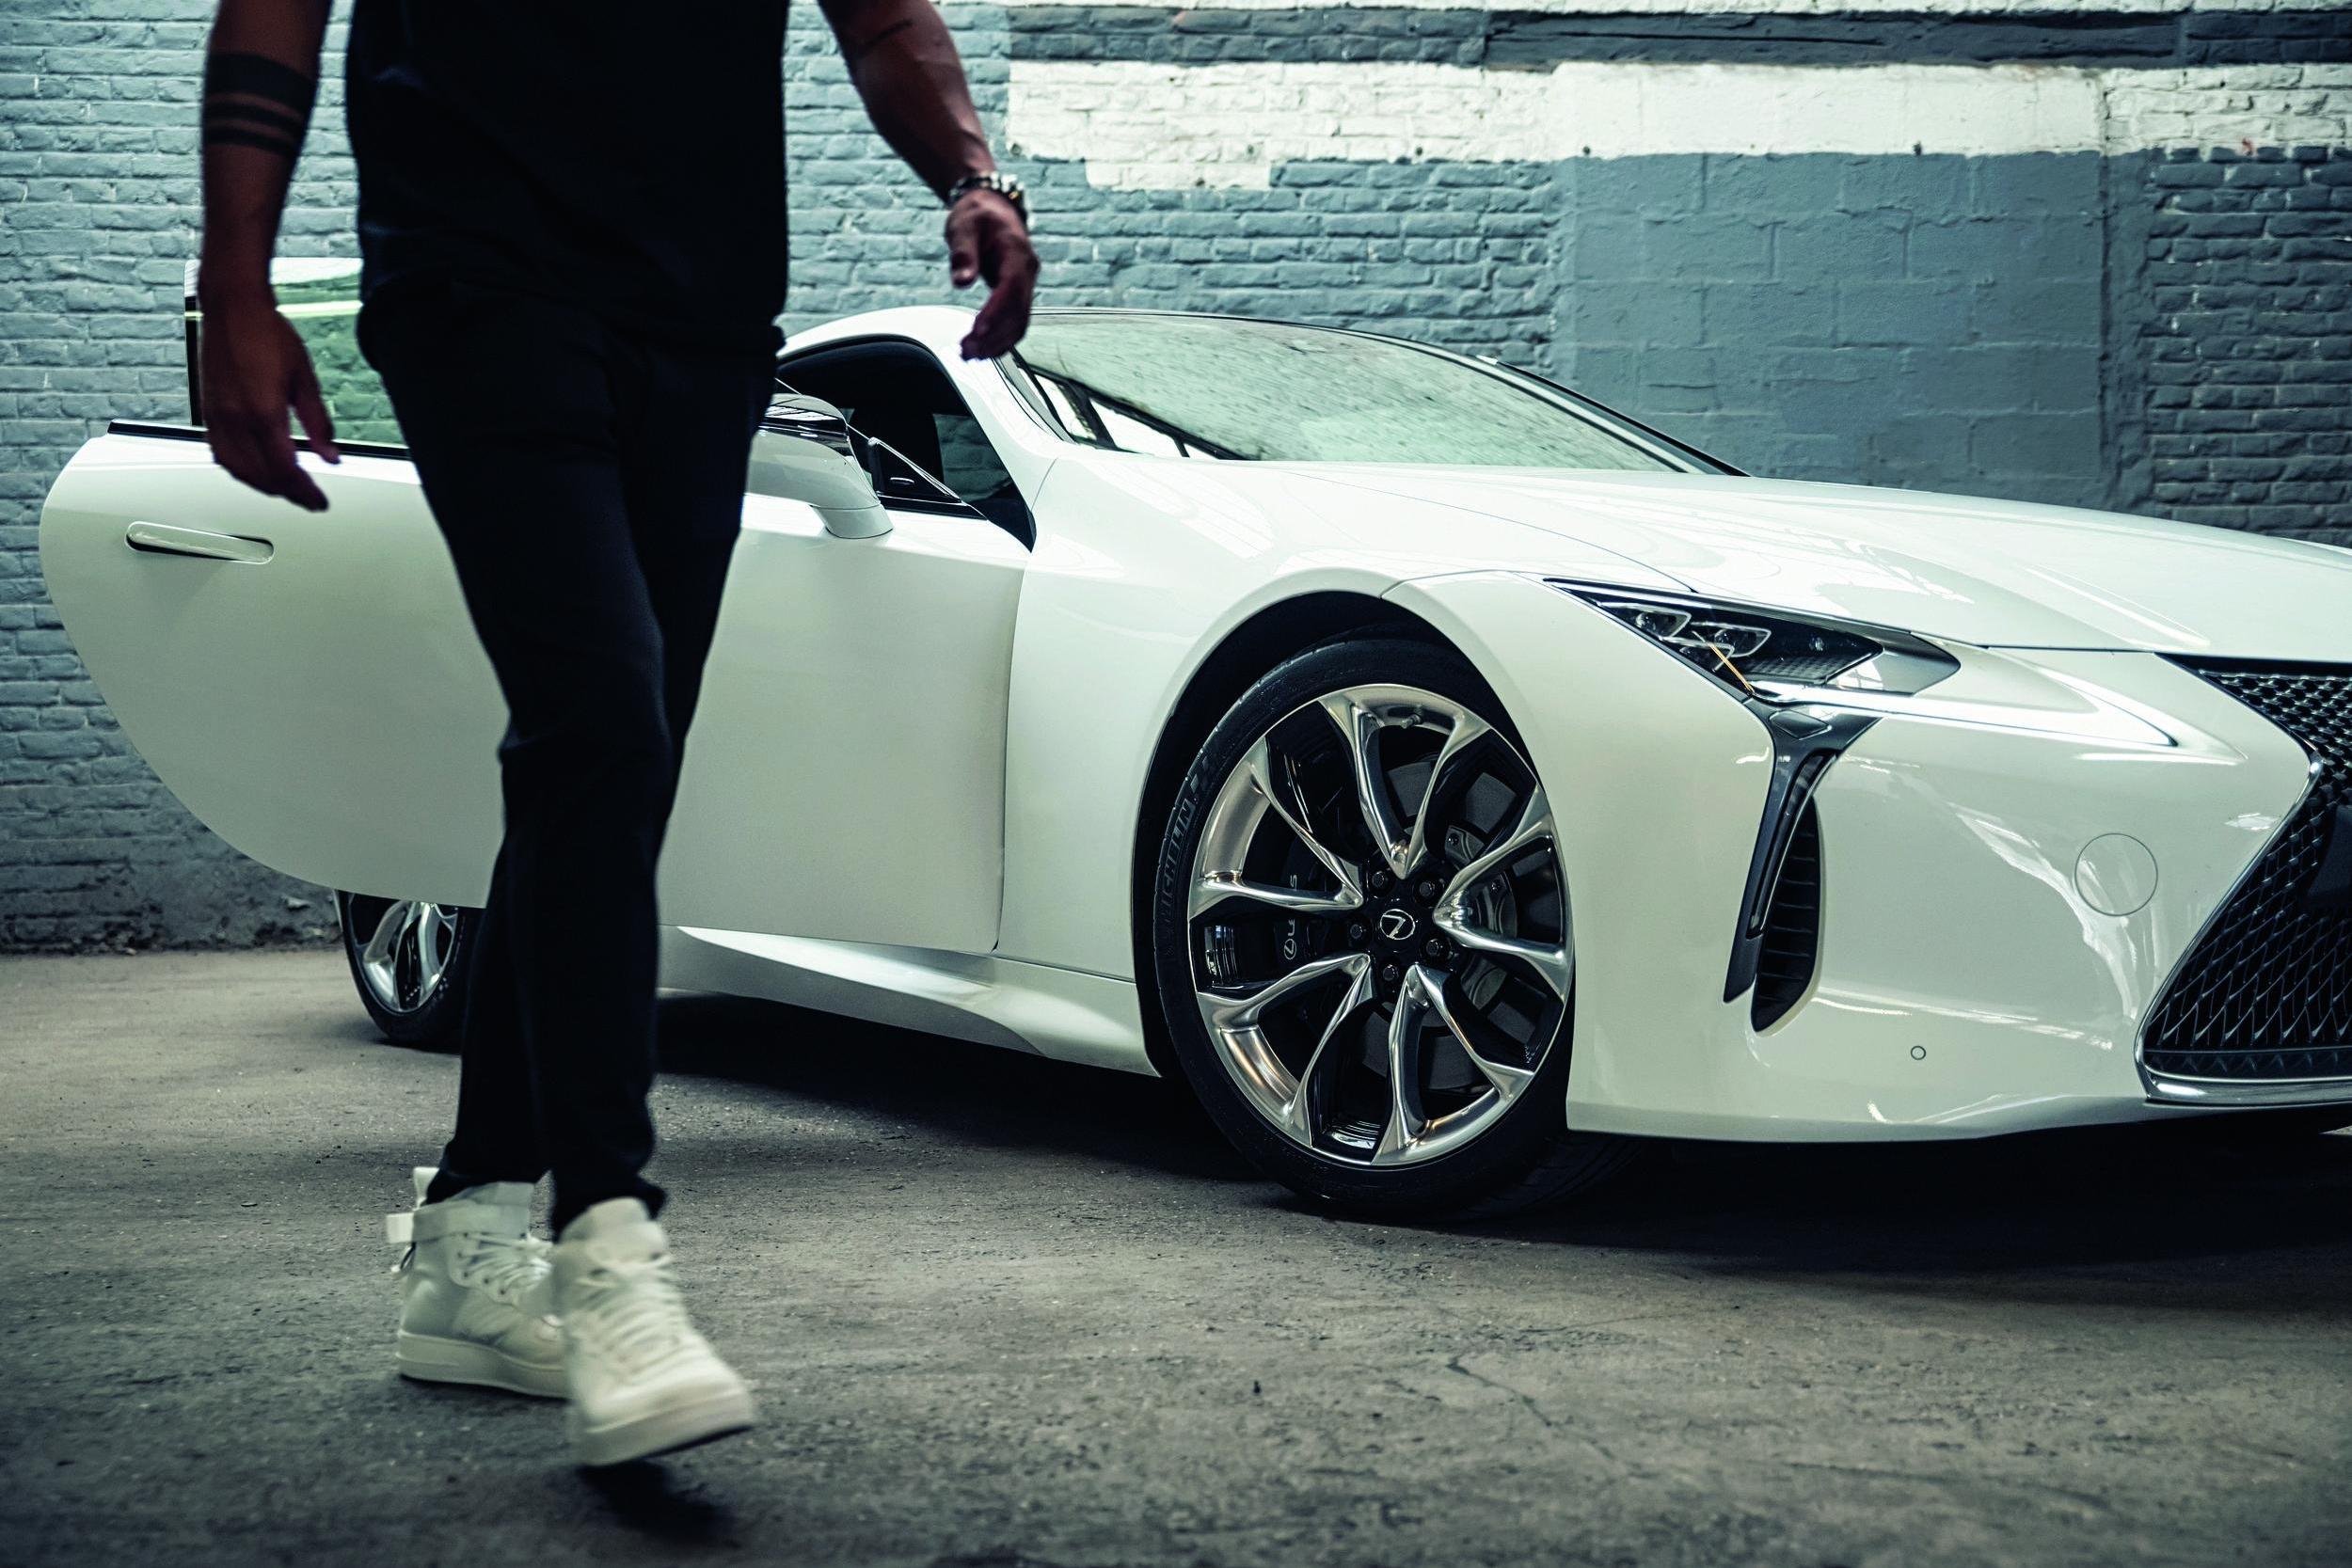 Regi Blinker & John Heitinga for Lexus LC500 By The Hattrick creative agency